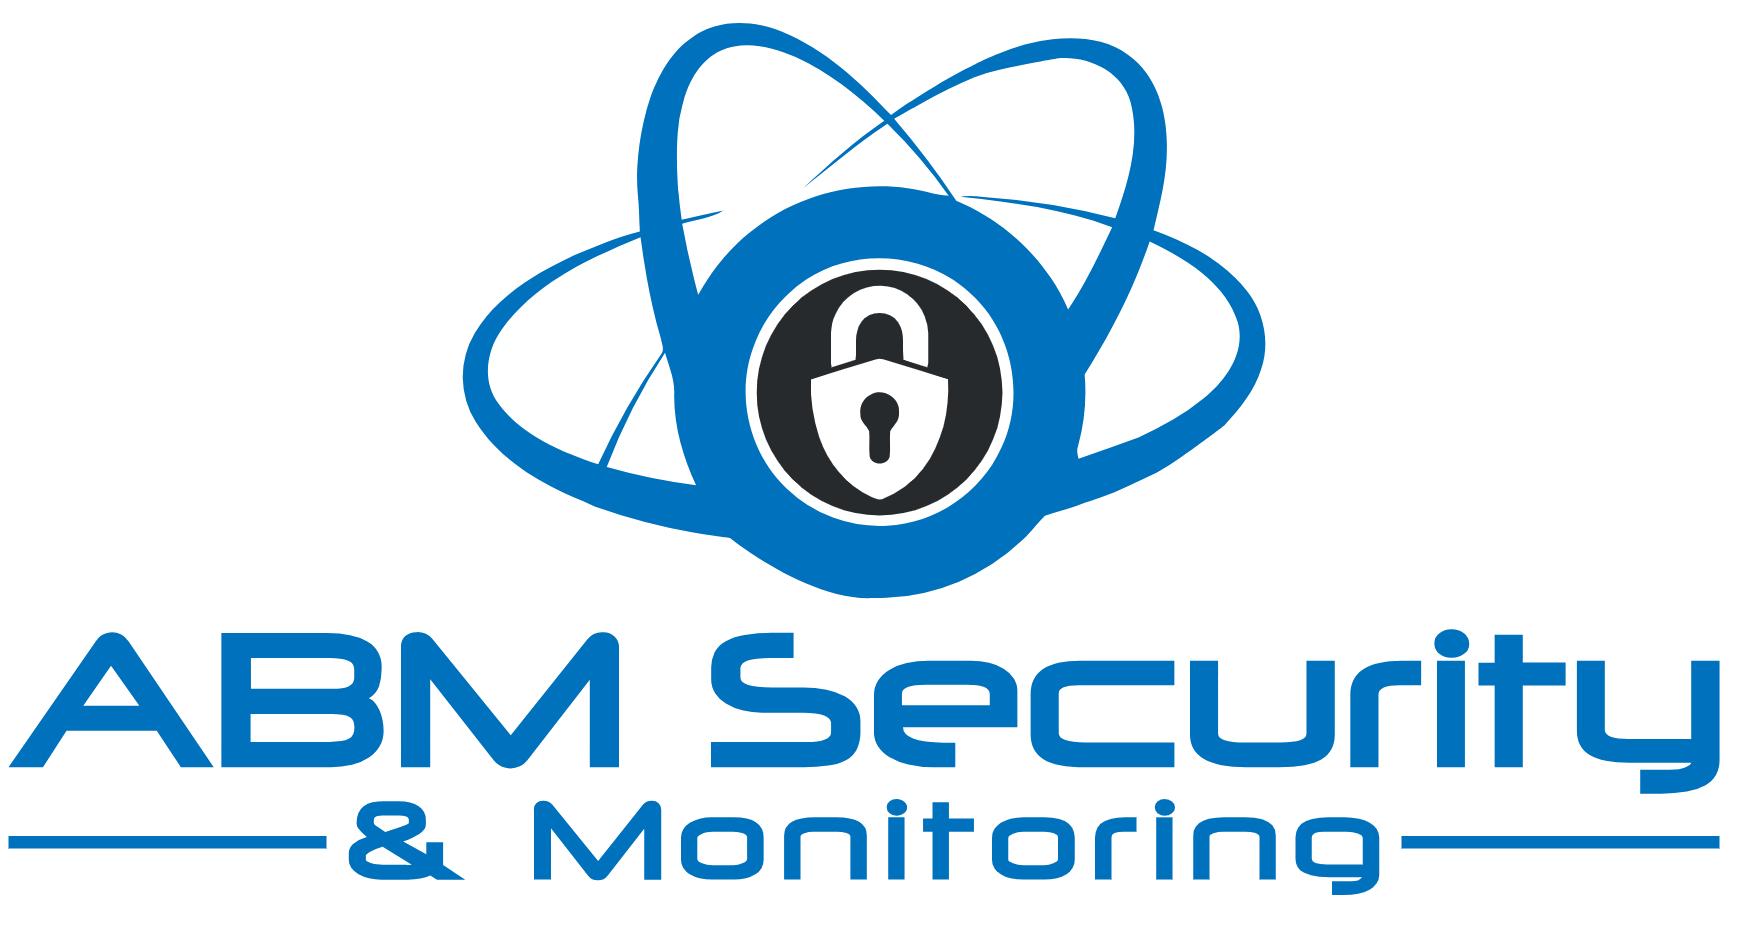 ABM Security & Monitoring